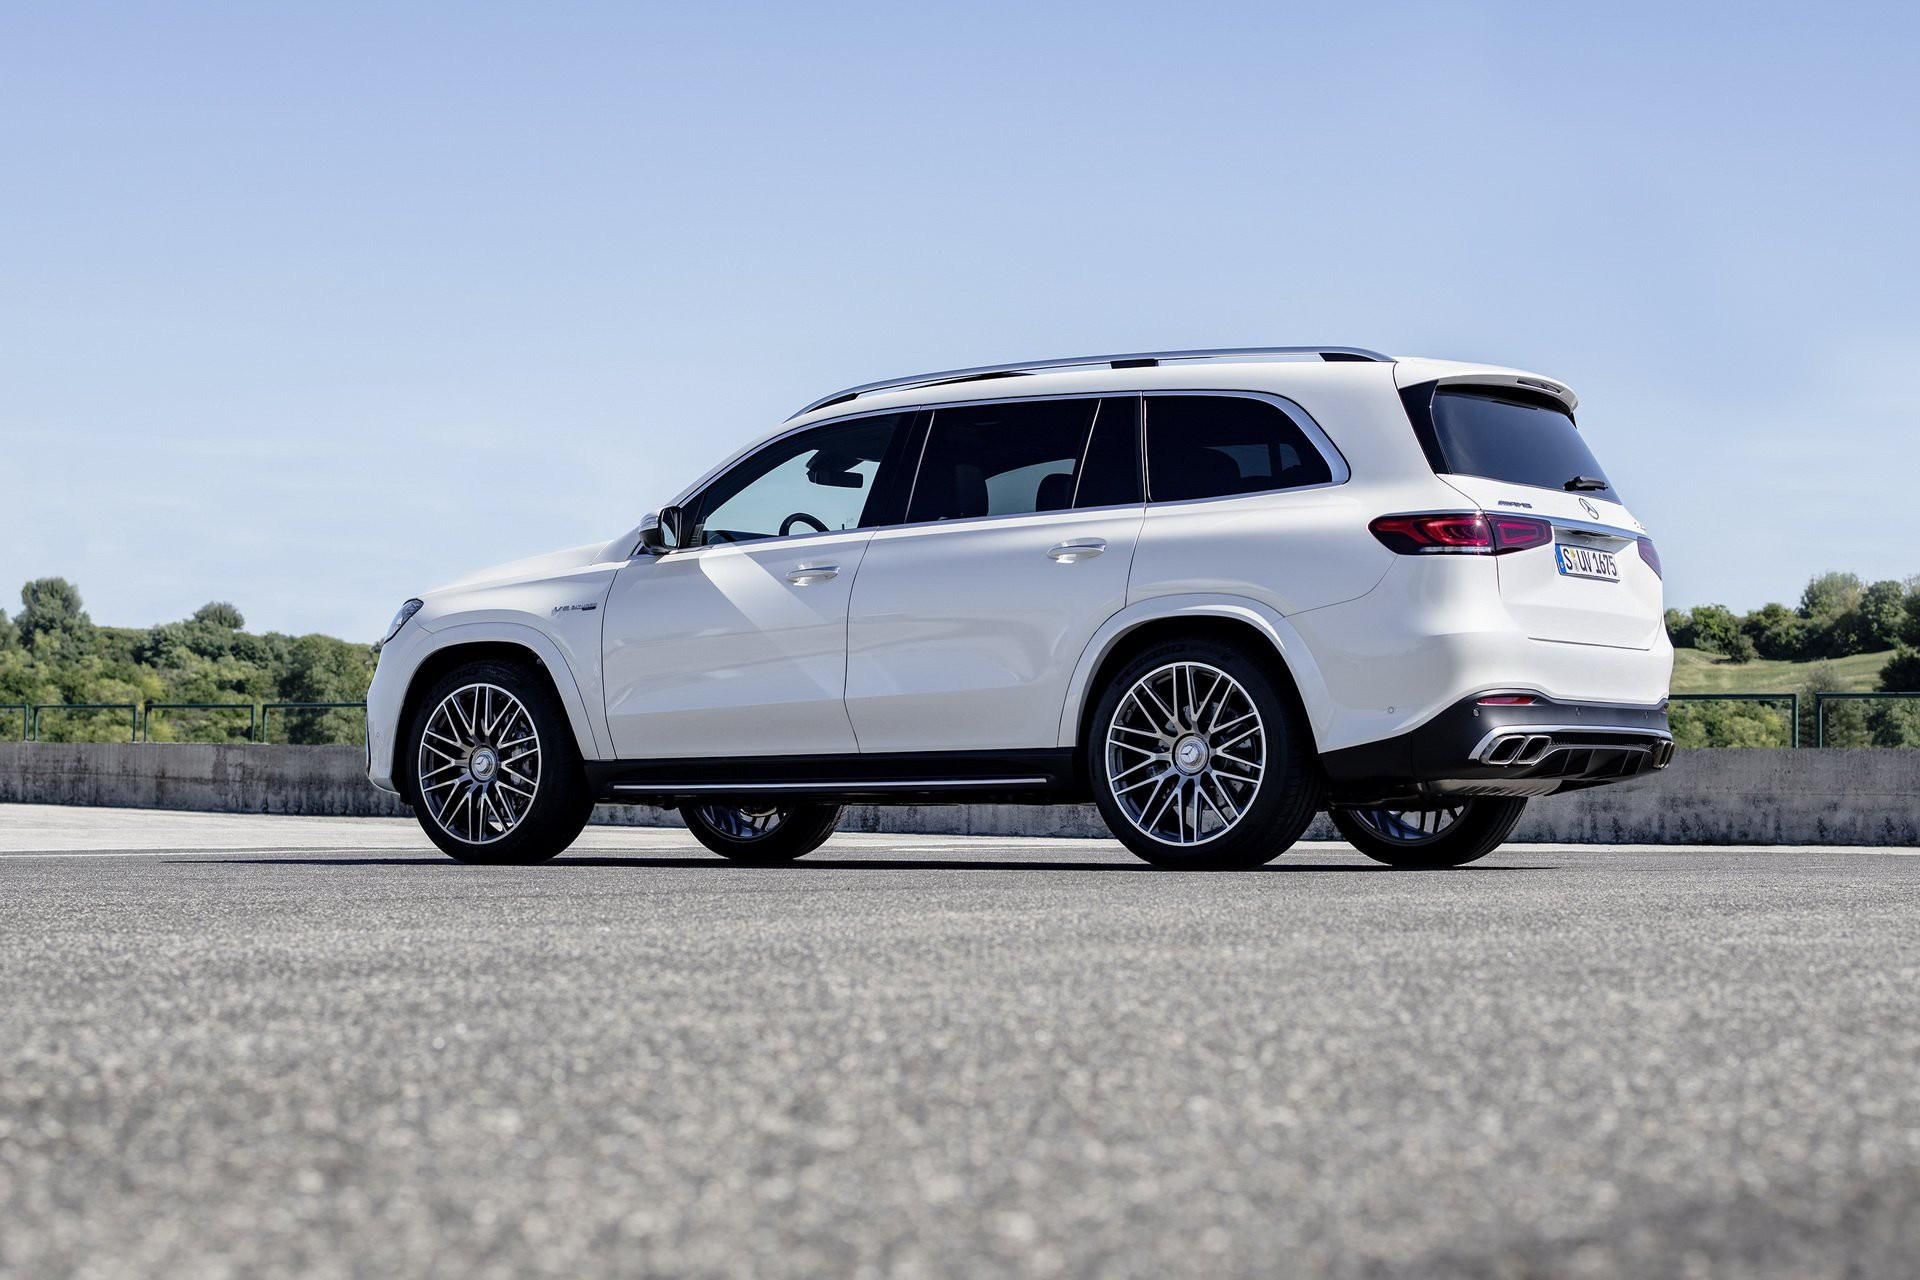 Khám phá Mercedes GLS 63 2020 vừa ra mắt Ảnh 6